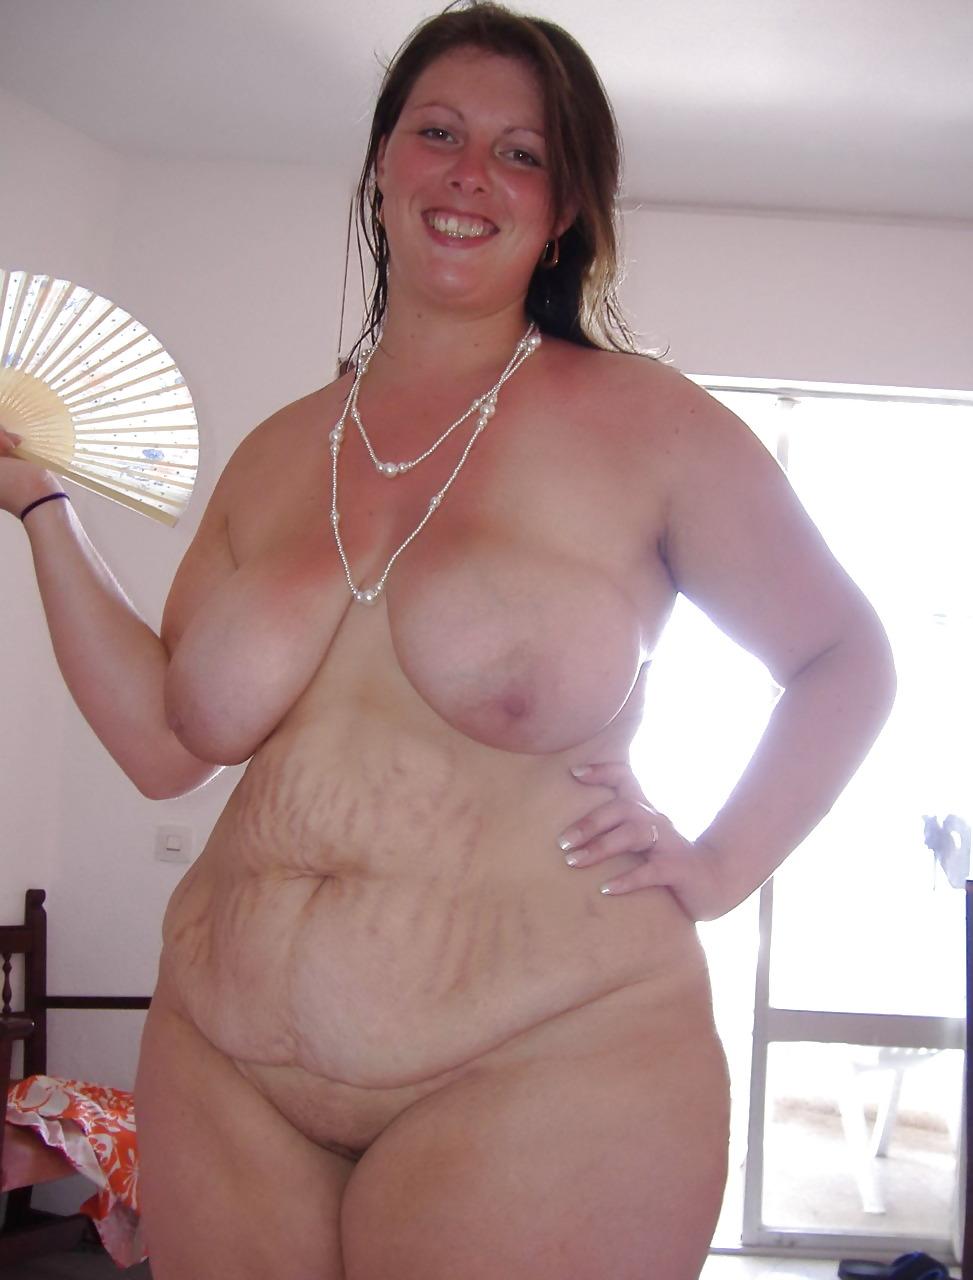 Chubby tan milf